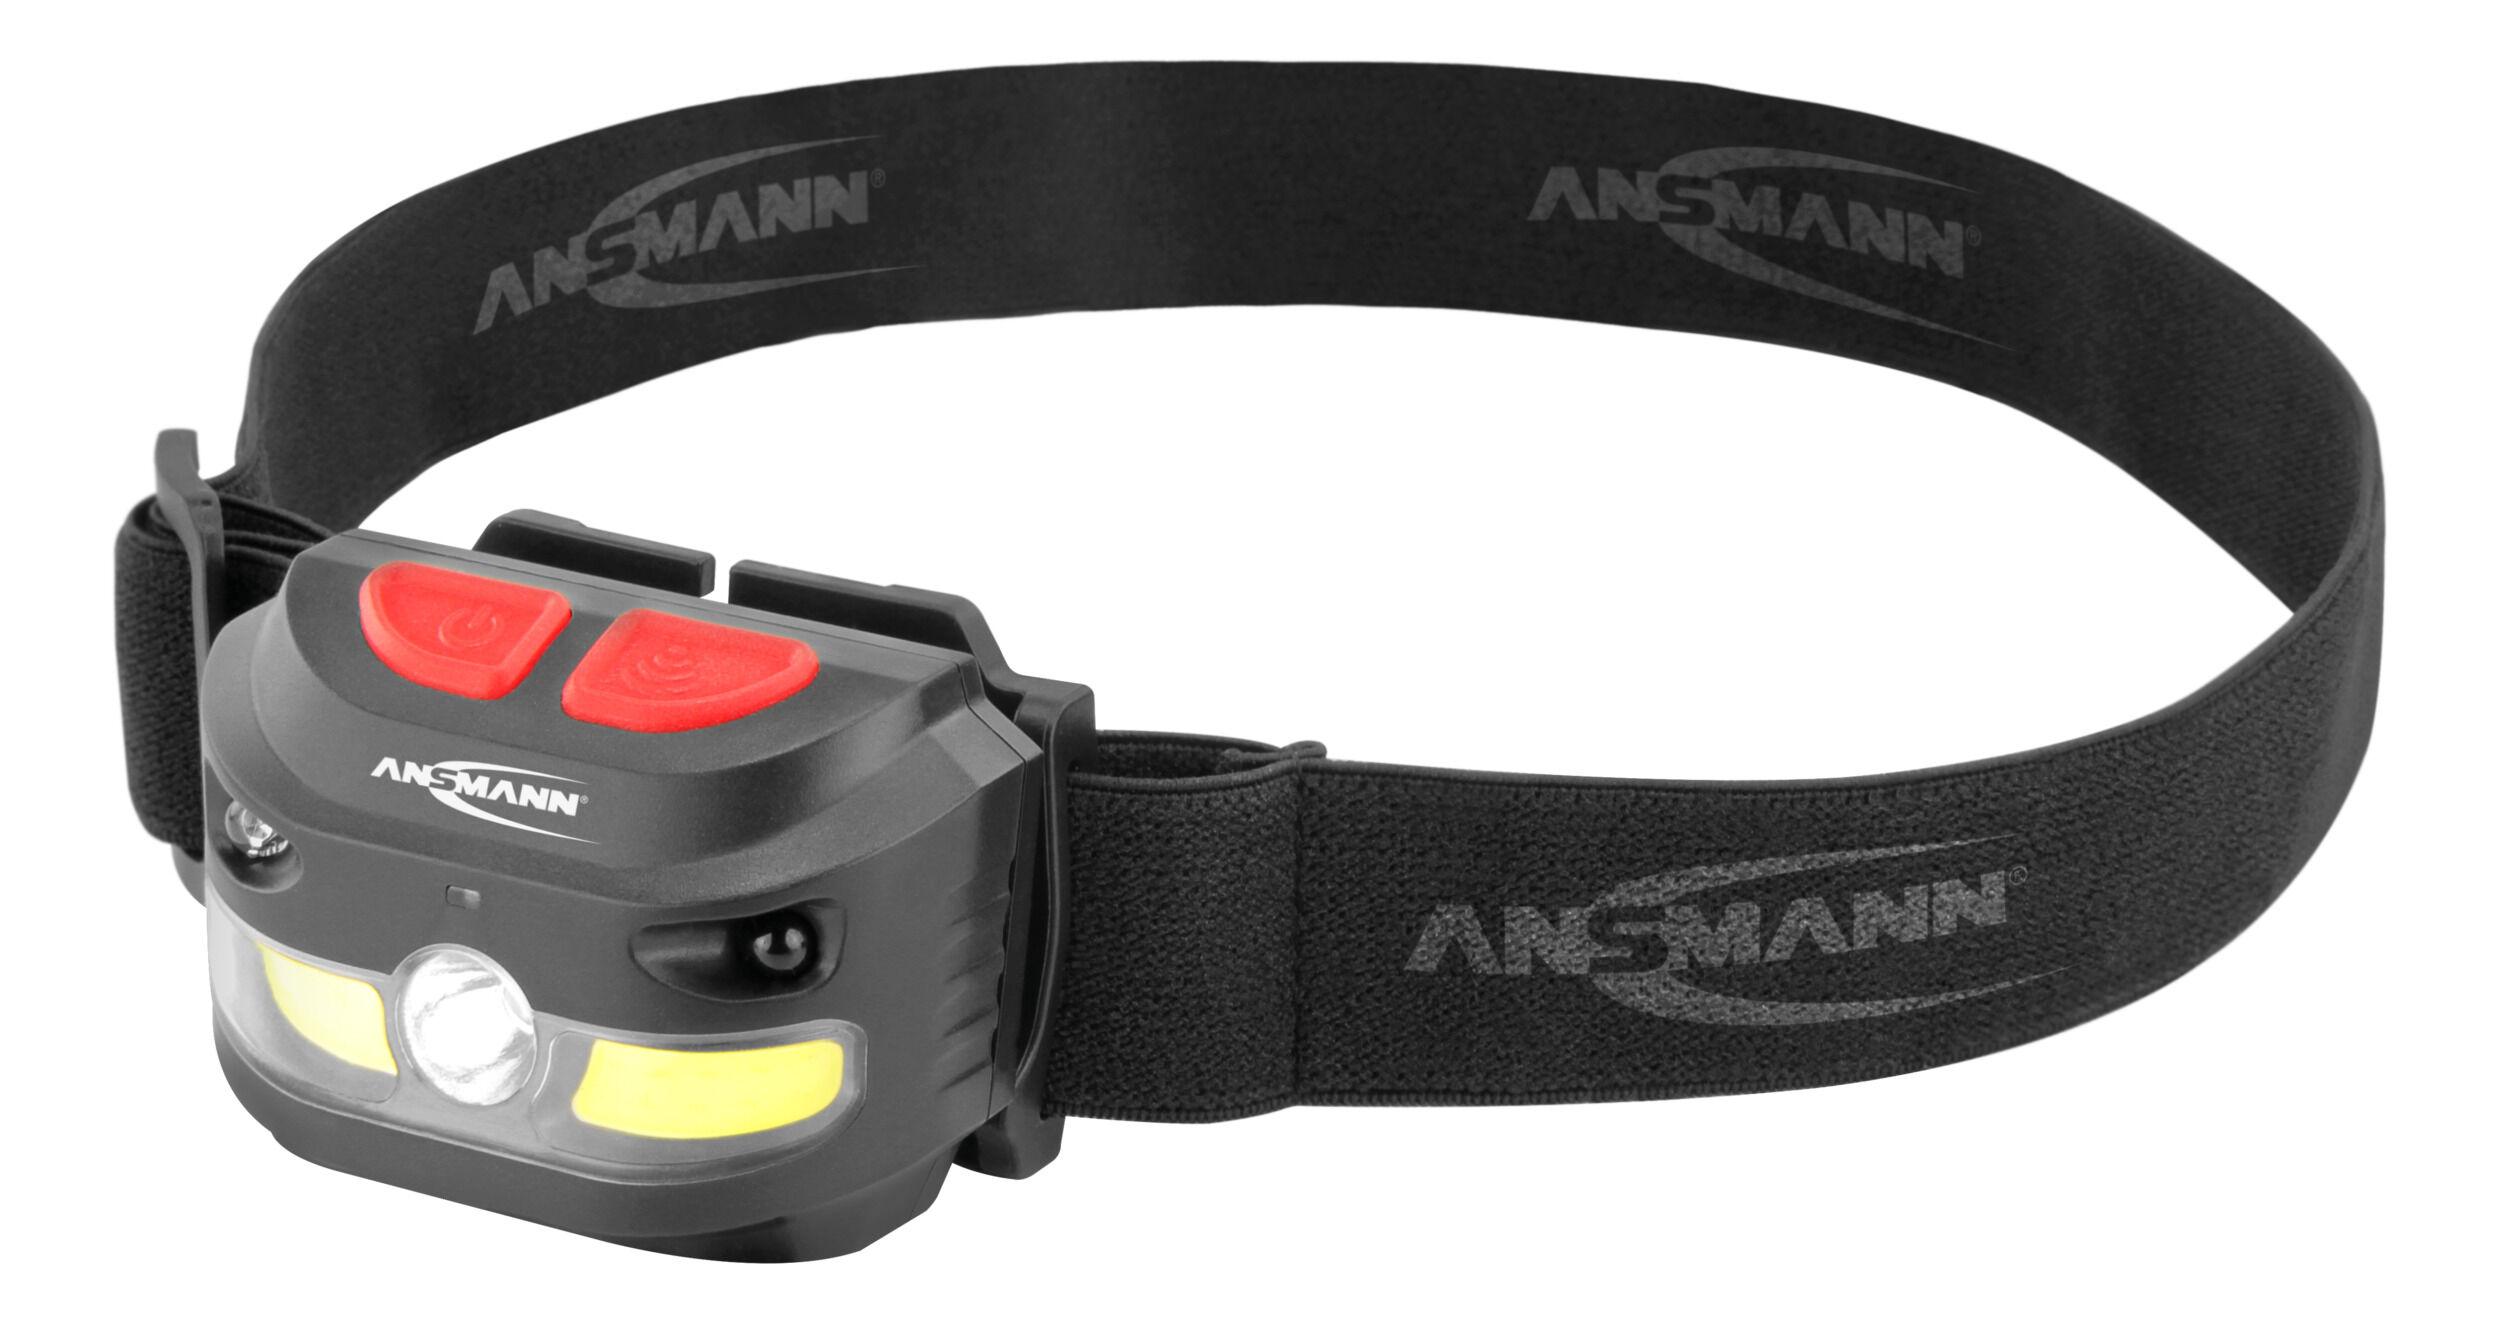 ANSMANN Akku LED Kopflampe 250 Lumen Sensor gesteuert - Stirnlampe HD250RS